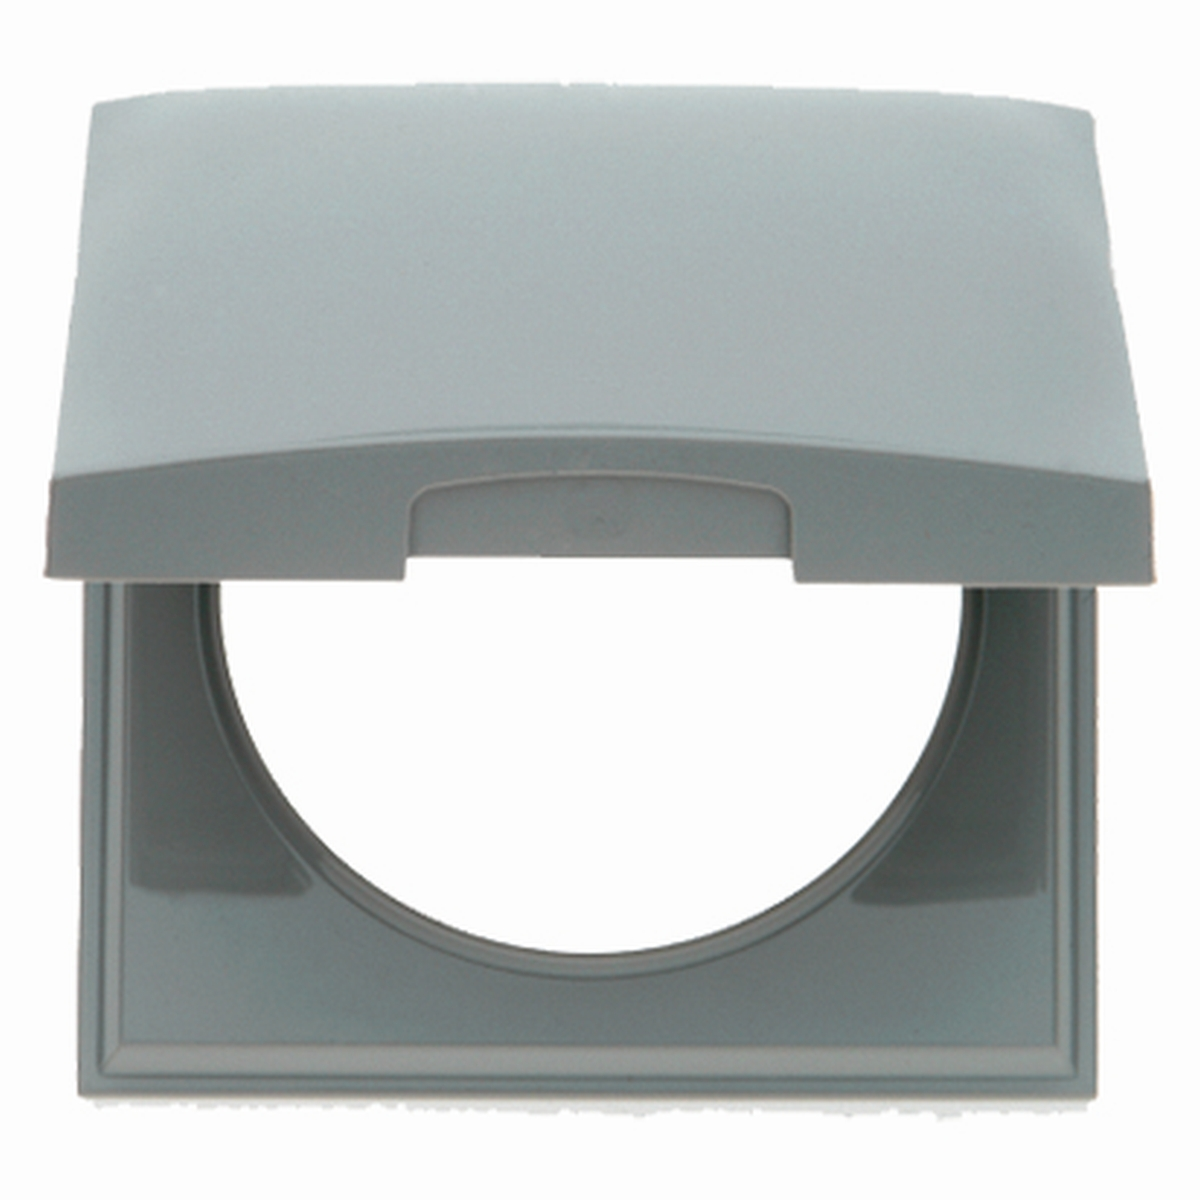 Berker Rahmen mit Deckel INTEGRO grau